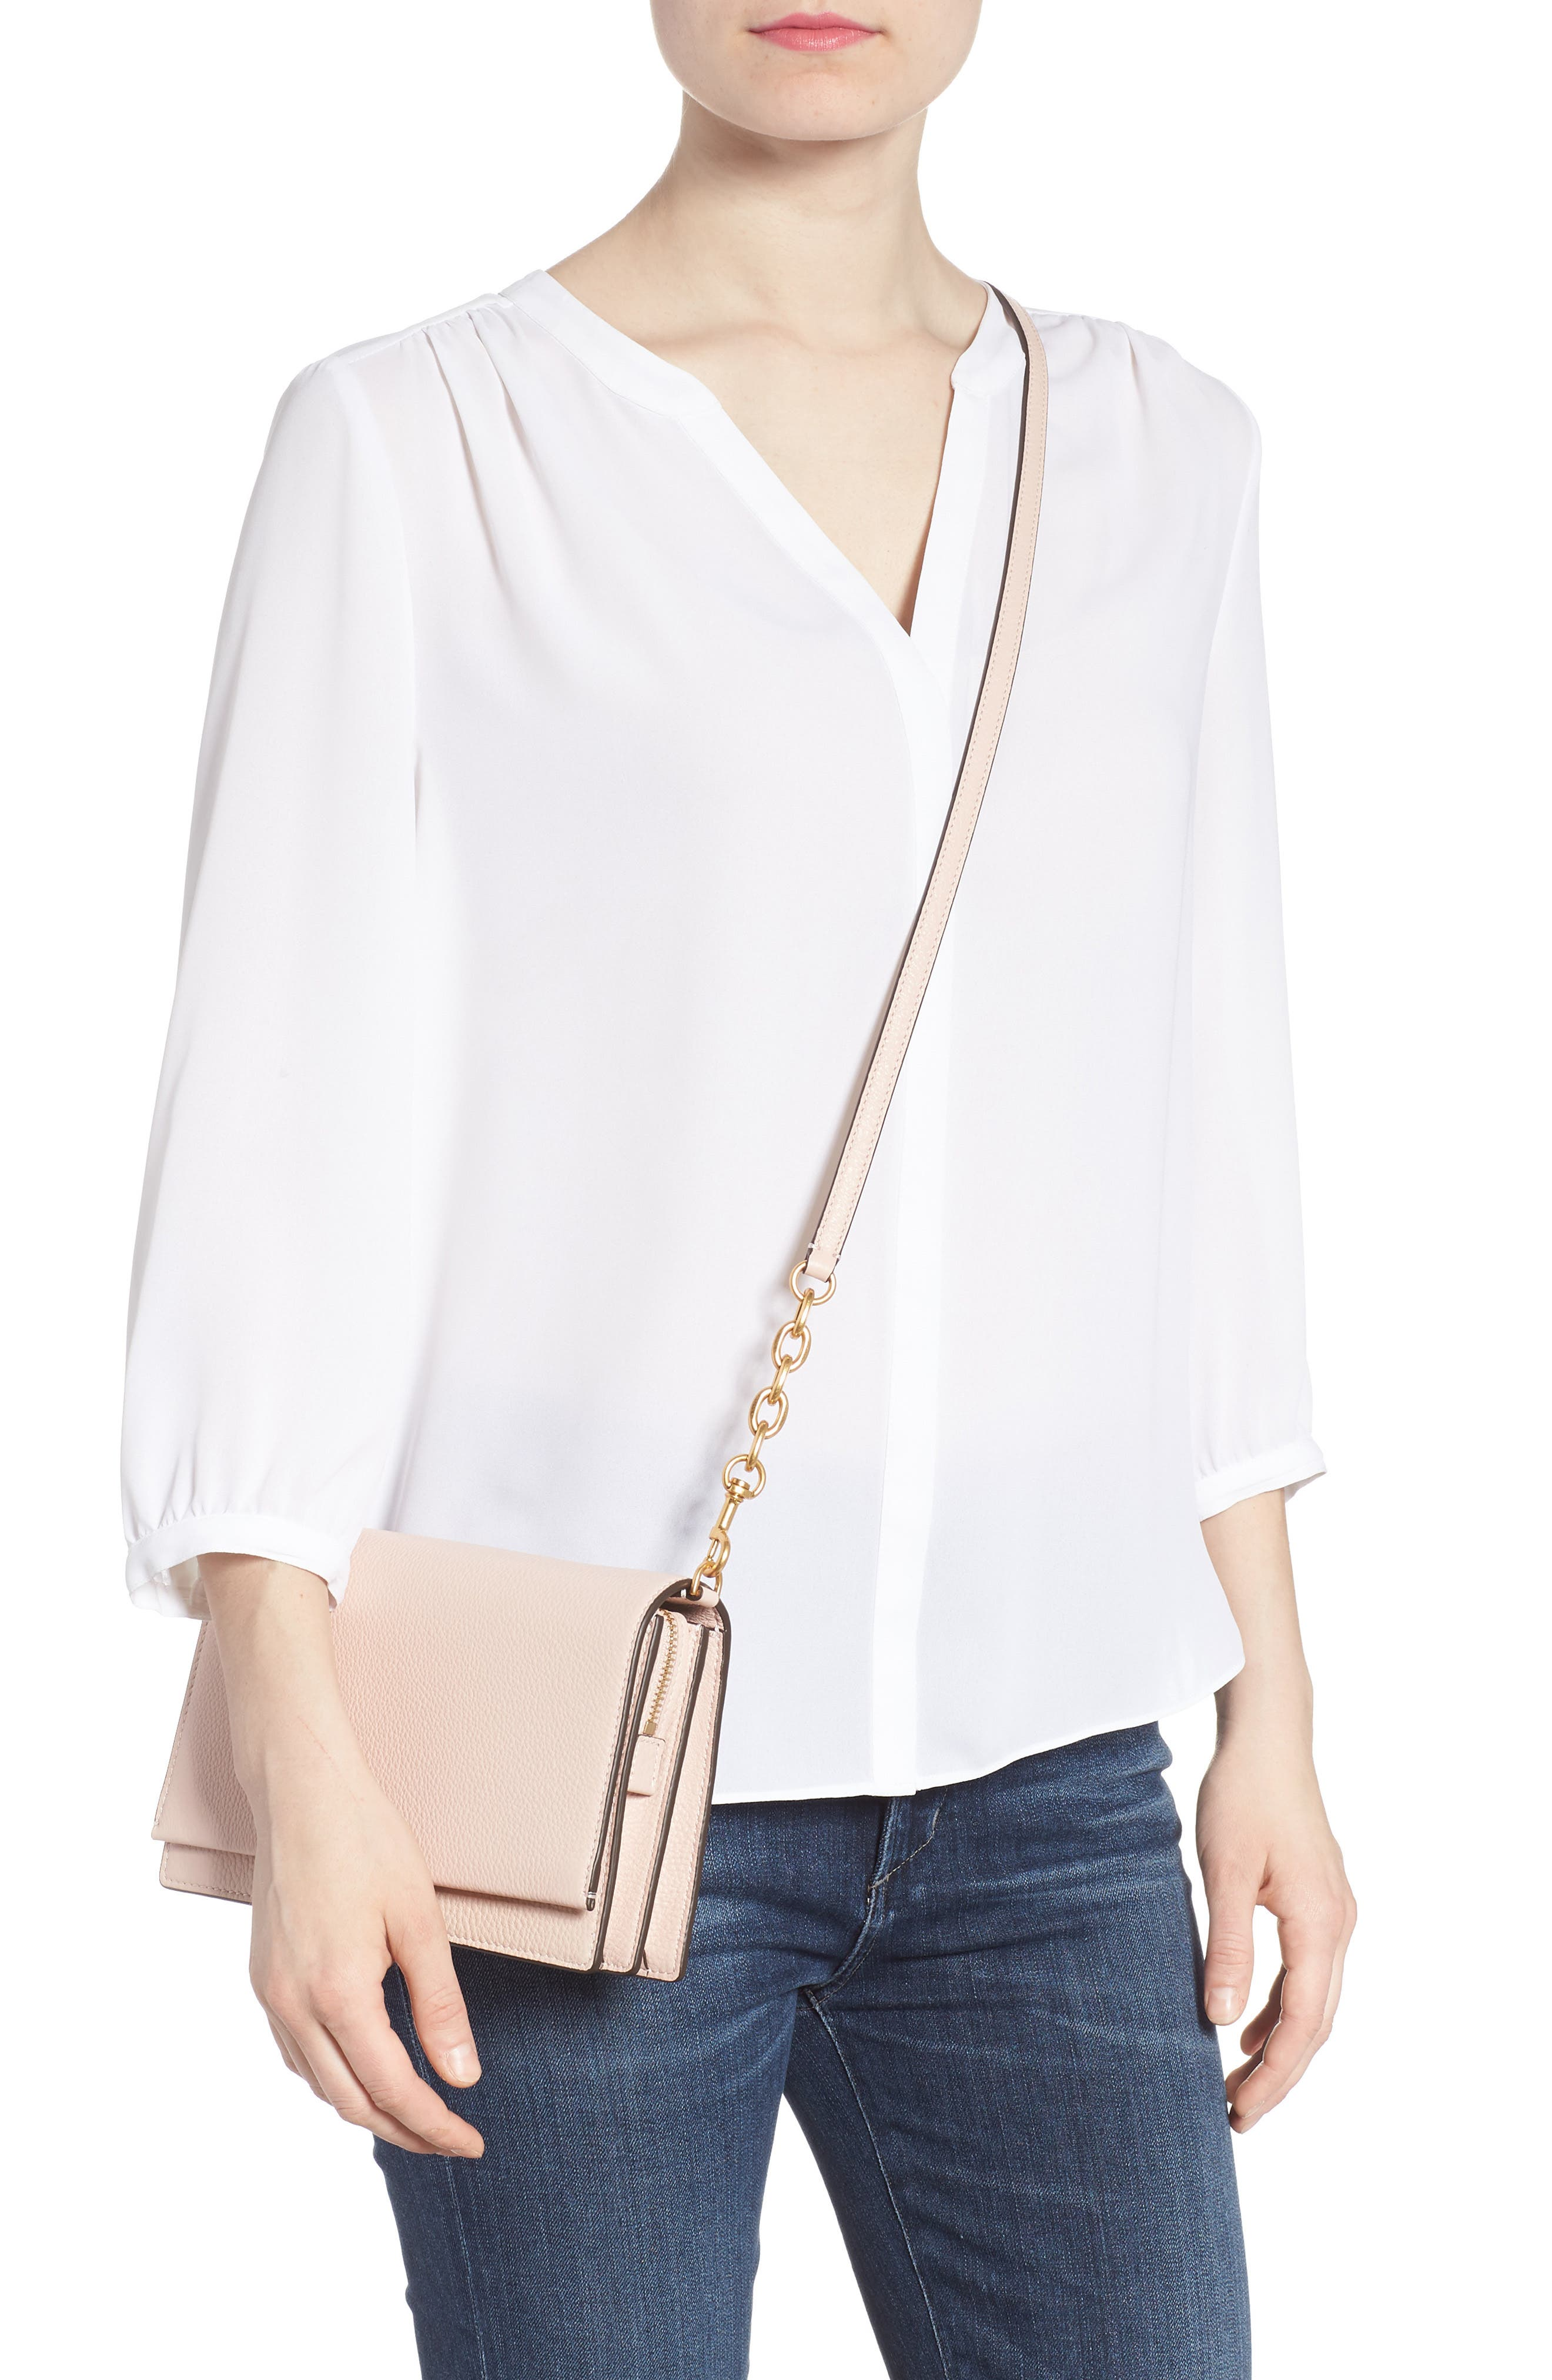 Georgia Pebble Leather Shoulder Bag,                             Alternate thumbnail 2, color,                             Shell Pink